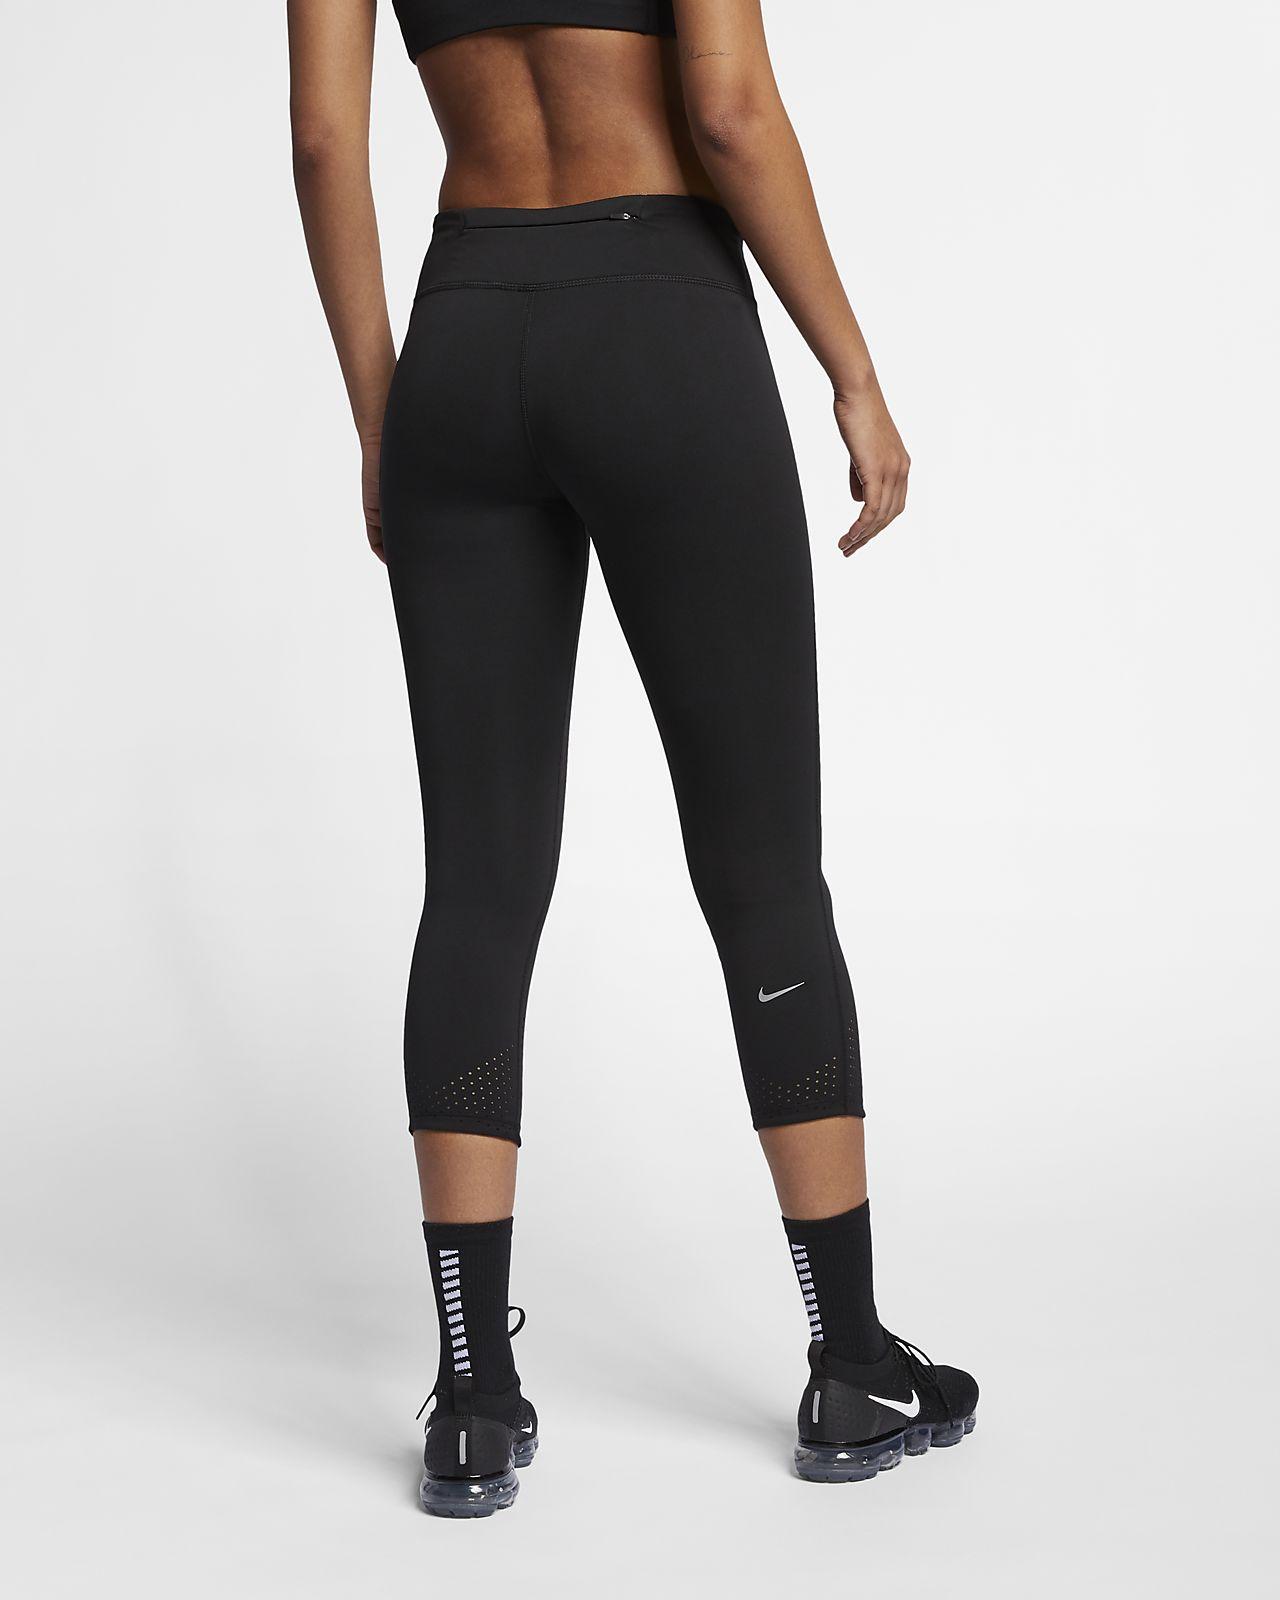 294fb36c920 Nike Epic Lux Women s Running Crops. Nike.com